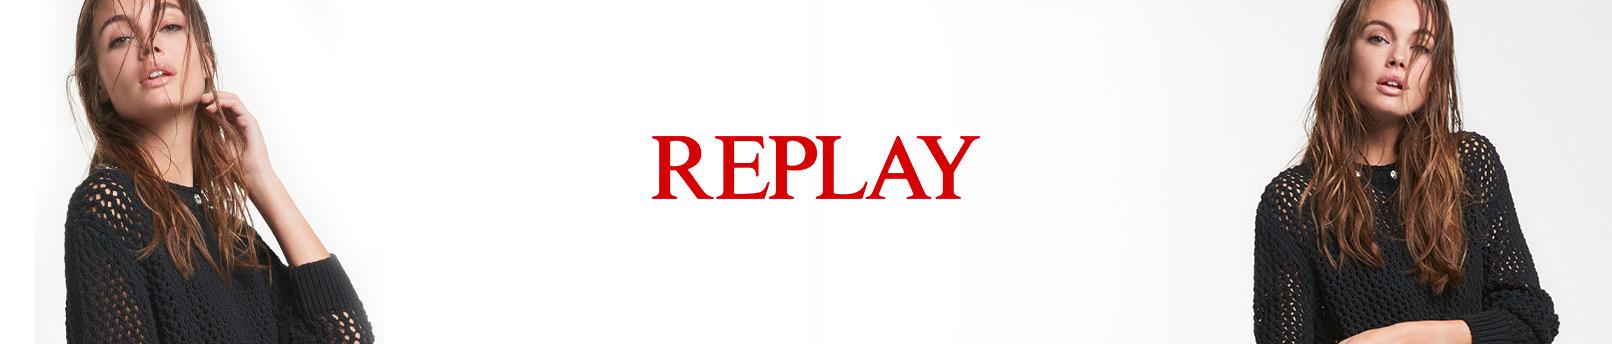 Shoppa Replay